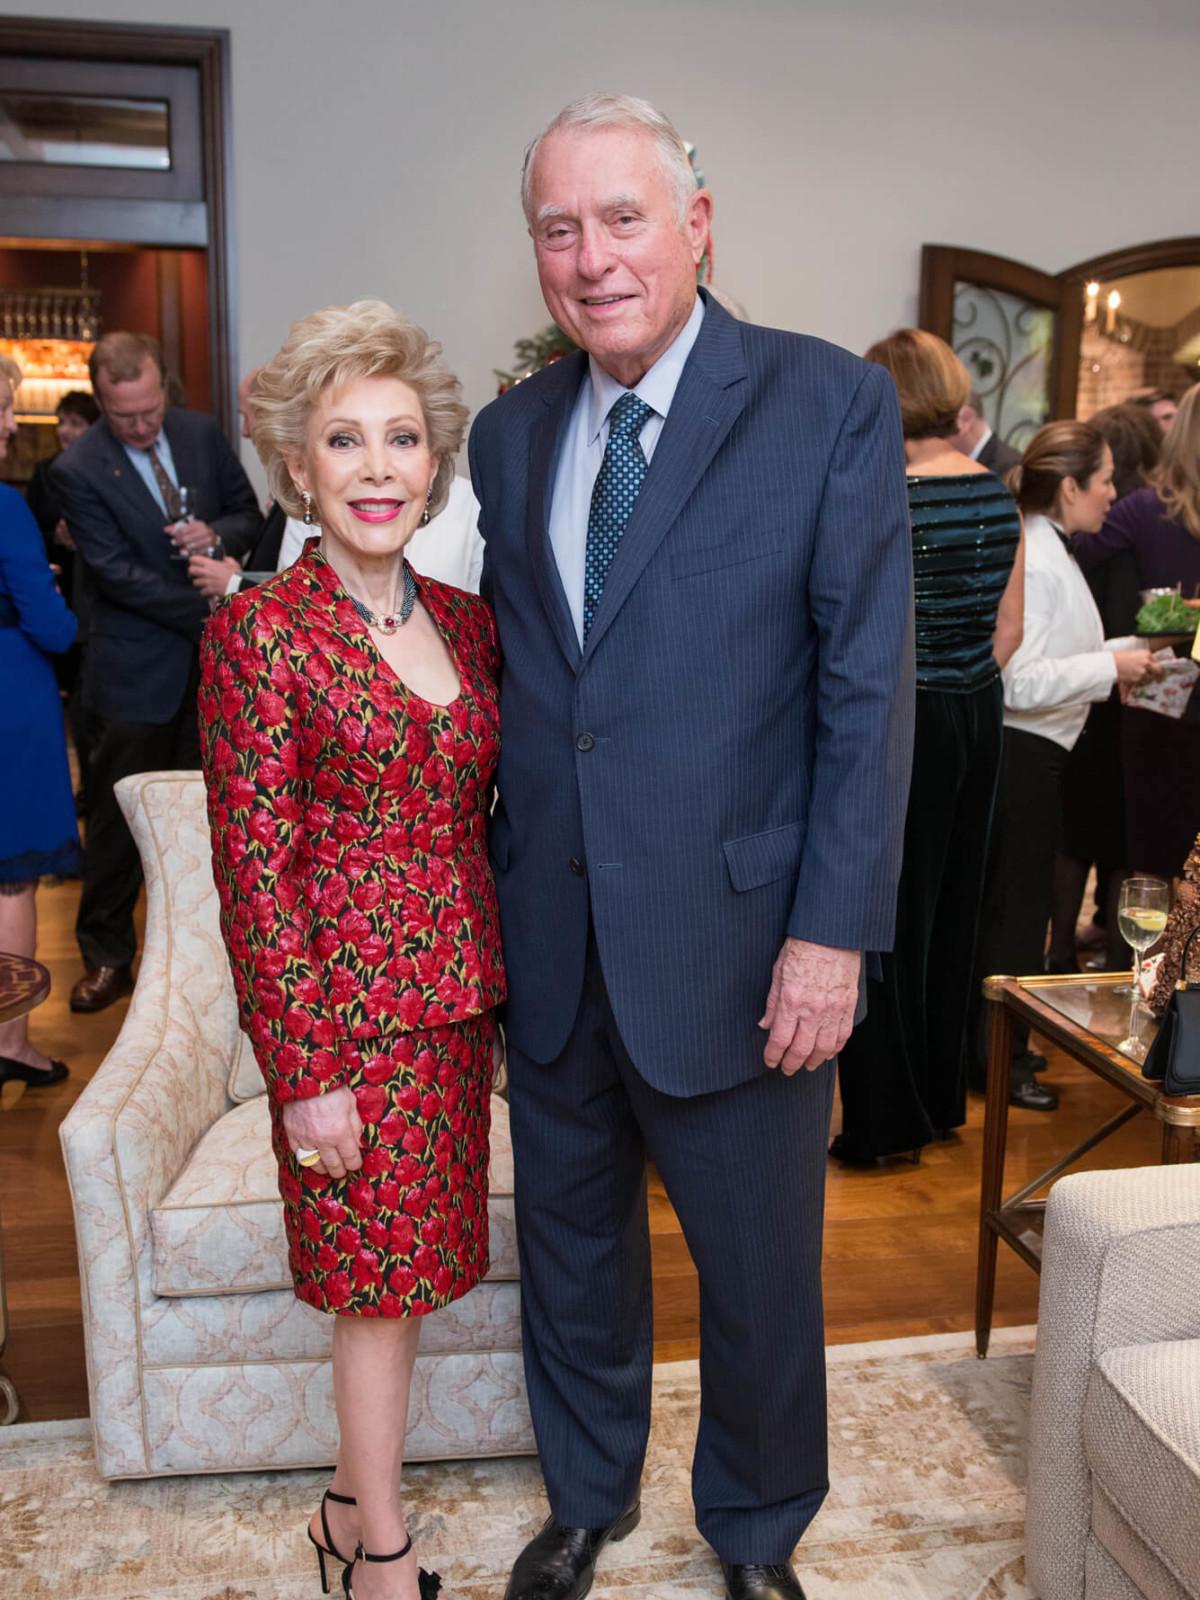 Celebration of Reading Author Reveal and Holiday Soirée-Margaret Alkek Williams, Jim Daneil